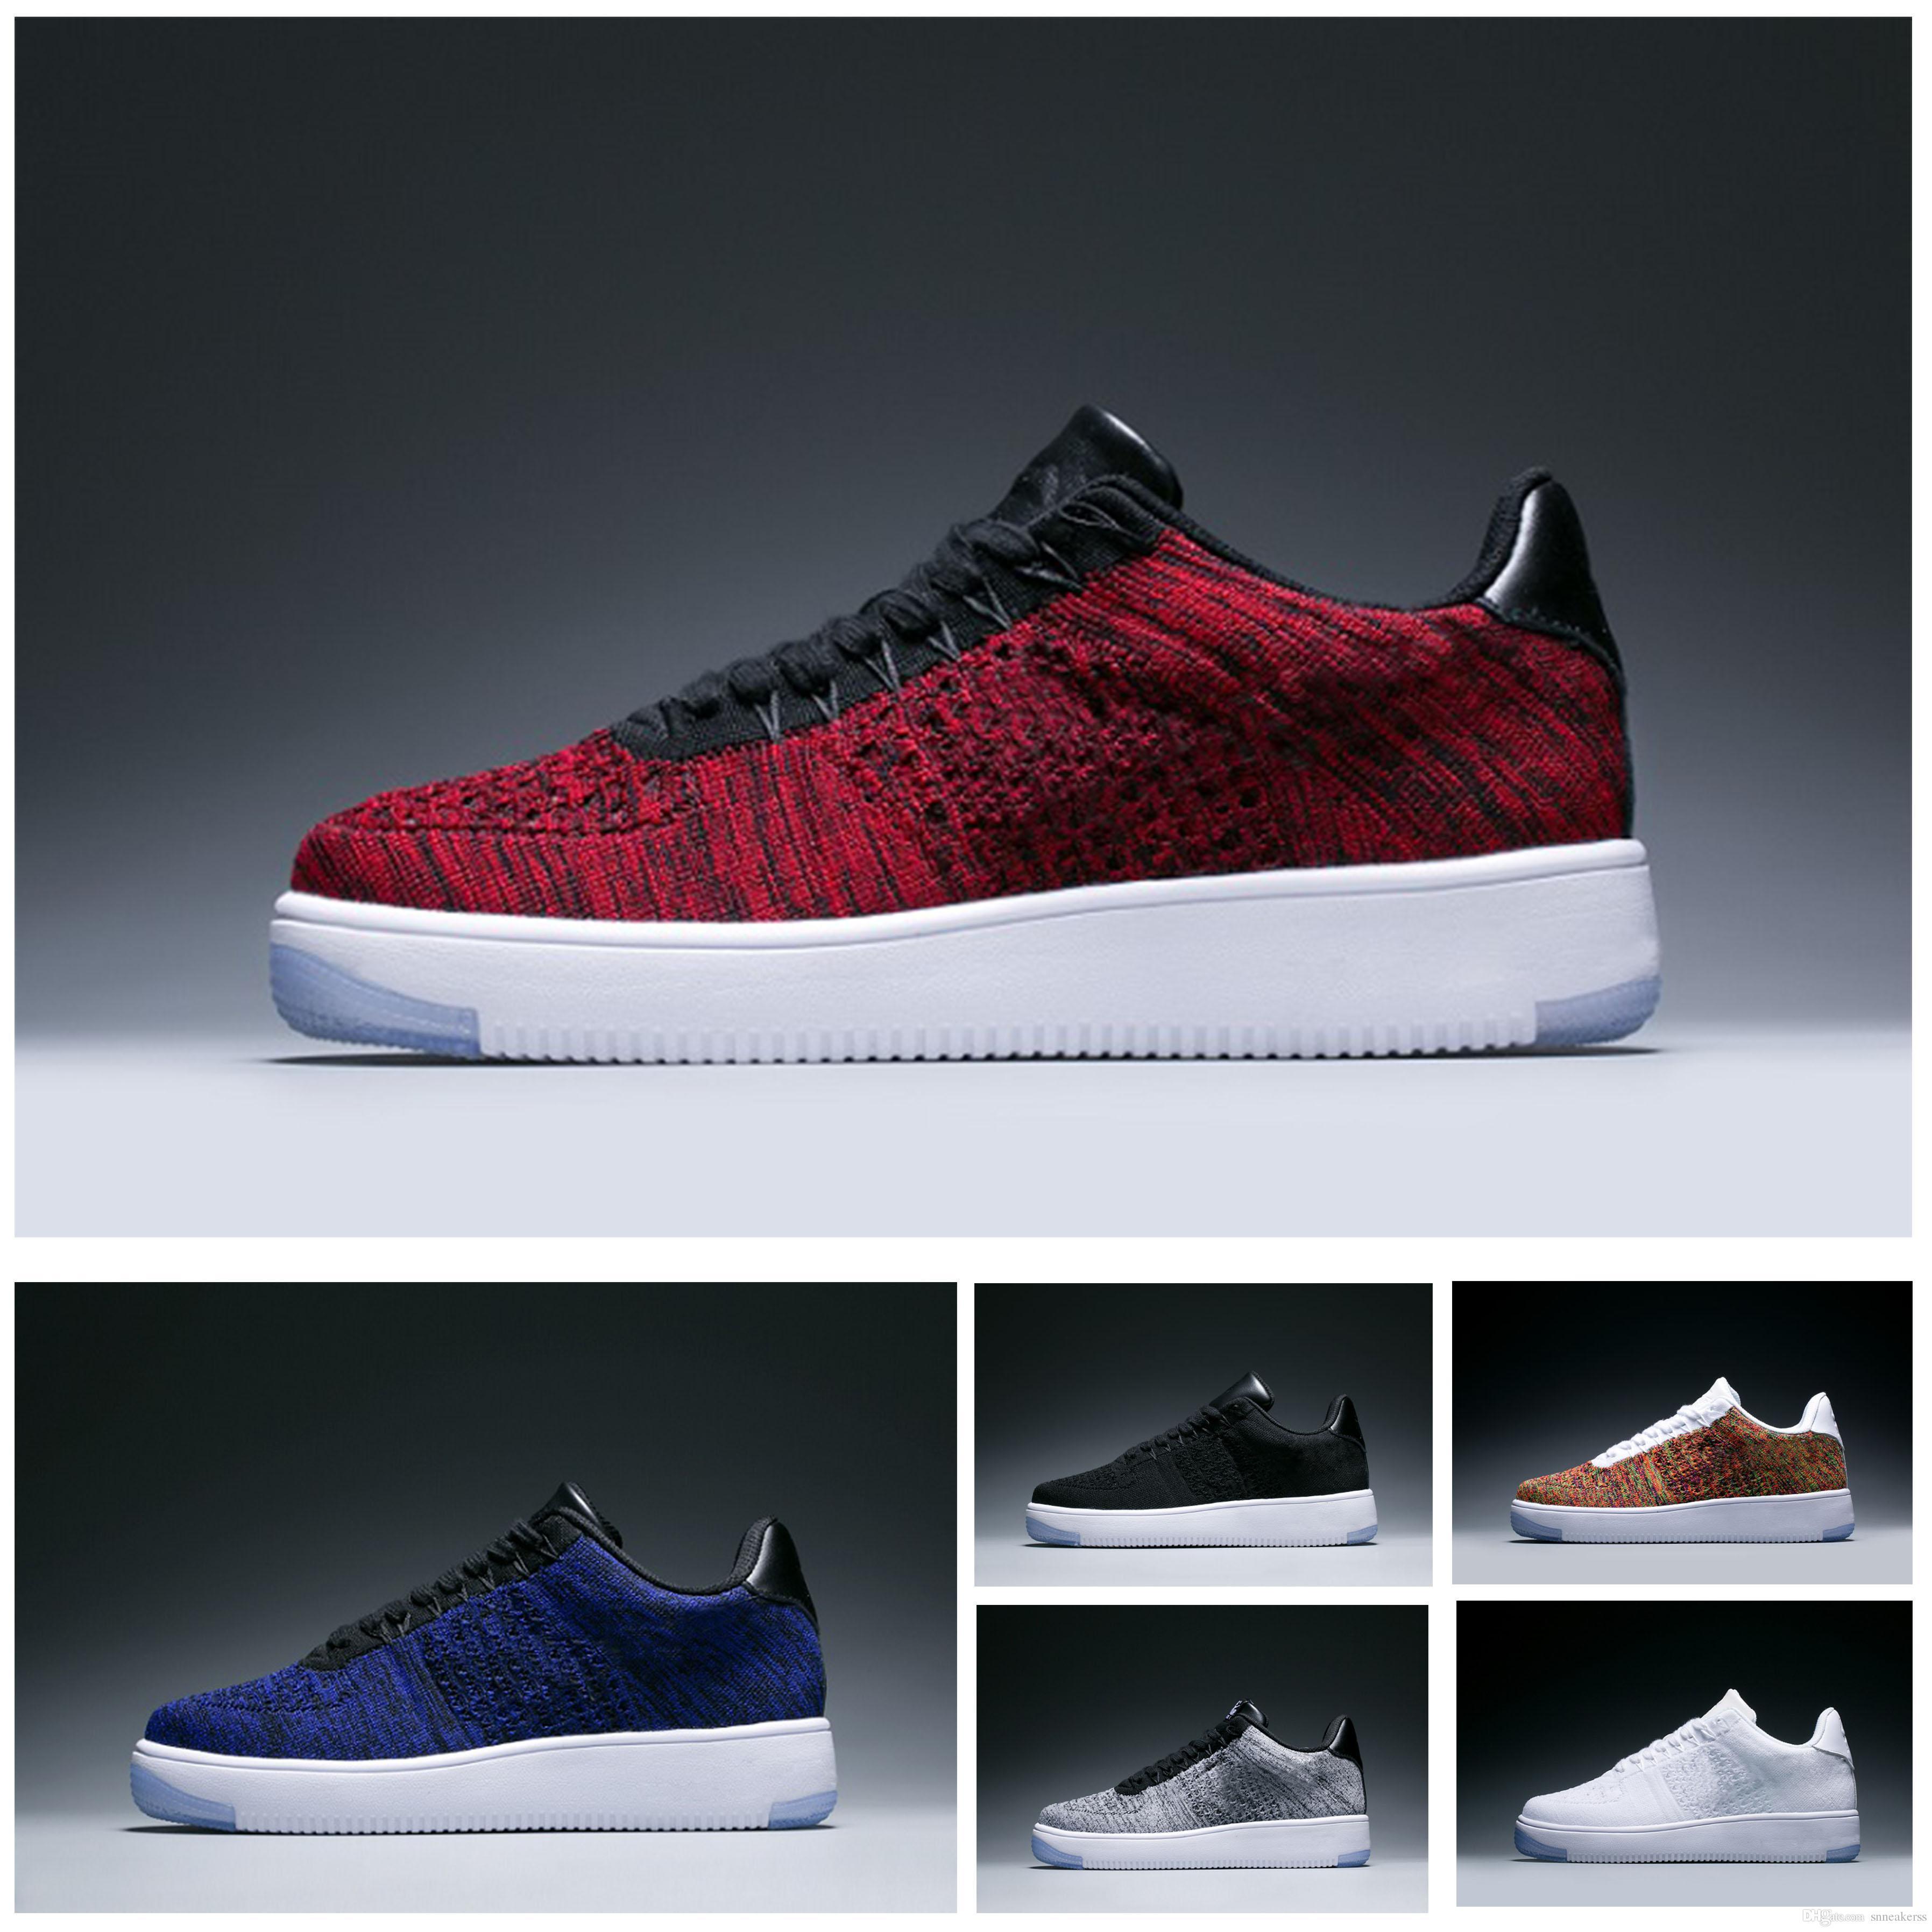 huge discount 5f580 833e8 Acheter Nike Air Force 1 Flyknit Af1 Designer Sneakers 2018 Casual Shoes  Nouveau Style Femmes Force High Low Lover Chaussures De Planche À Roulettes  Une ...